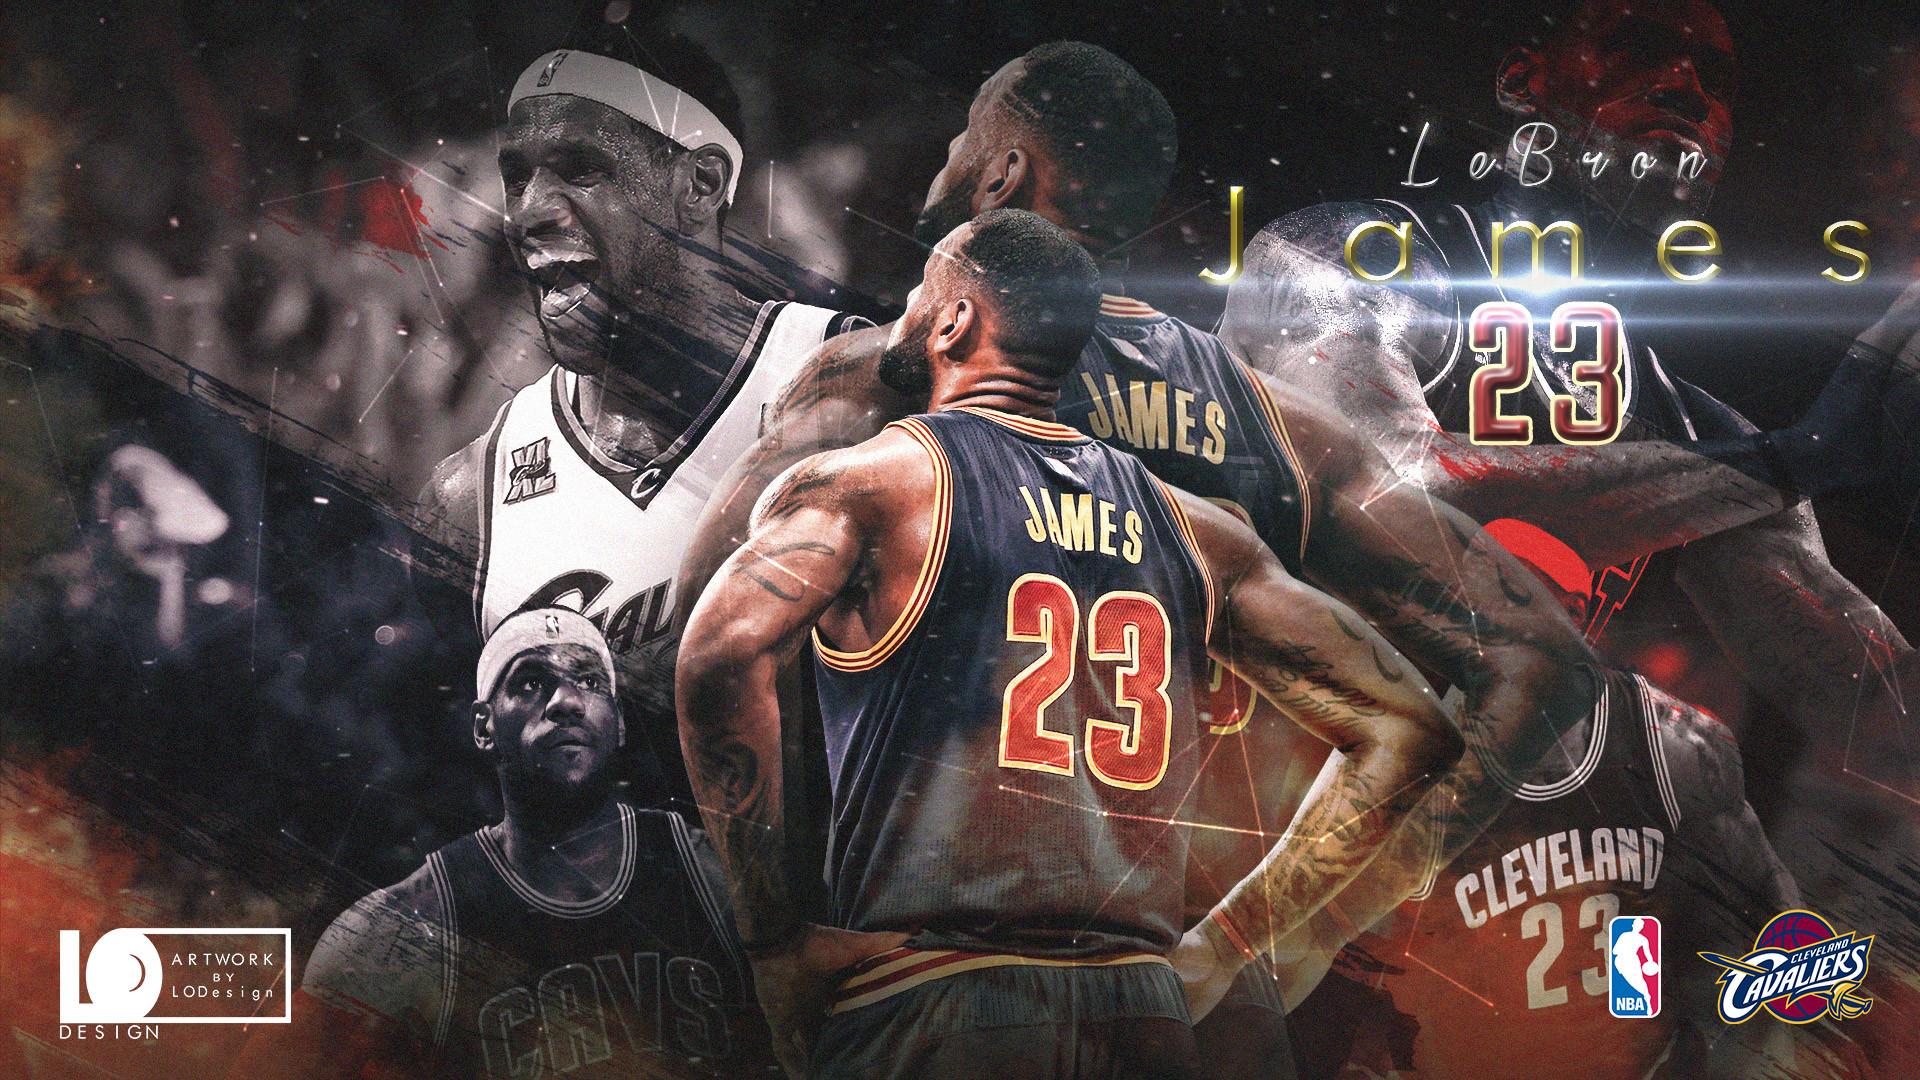 LeBron James 2017 Playoffs Wallpaper